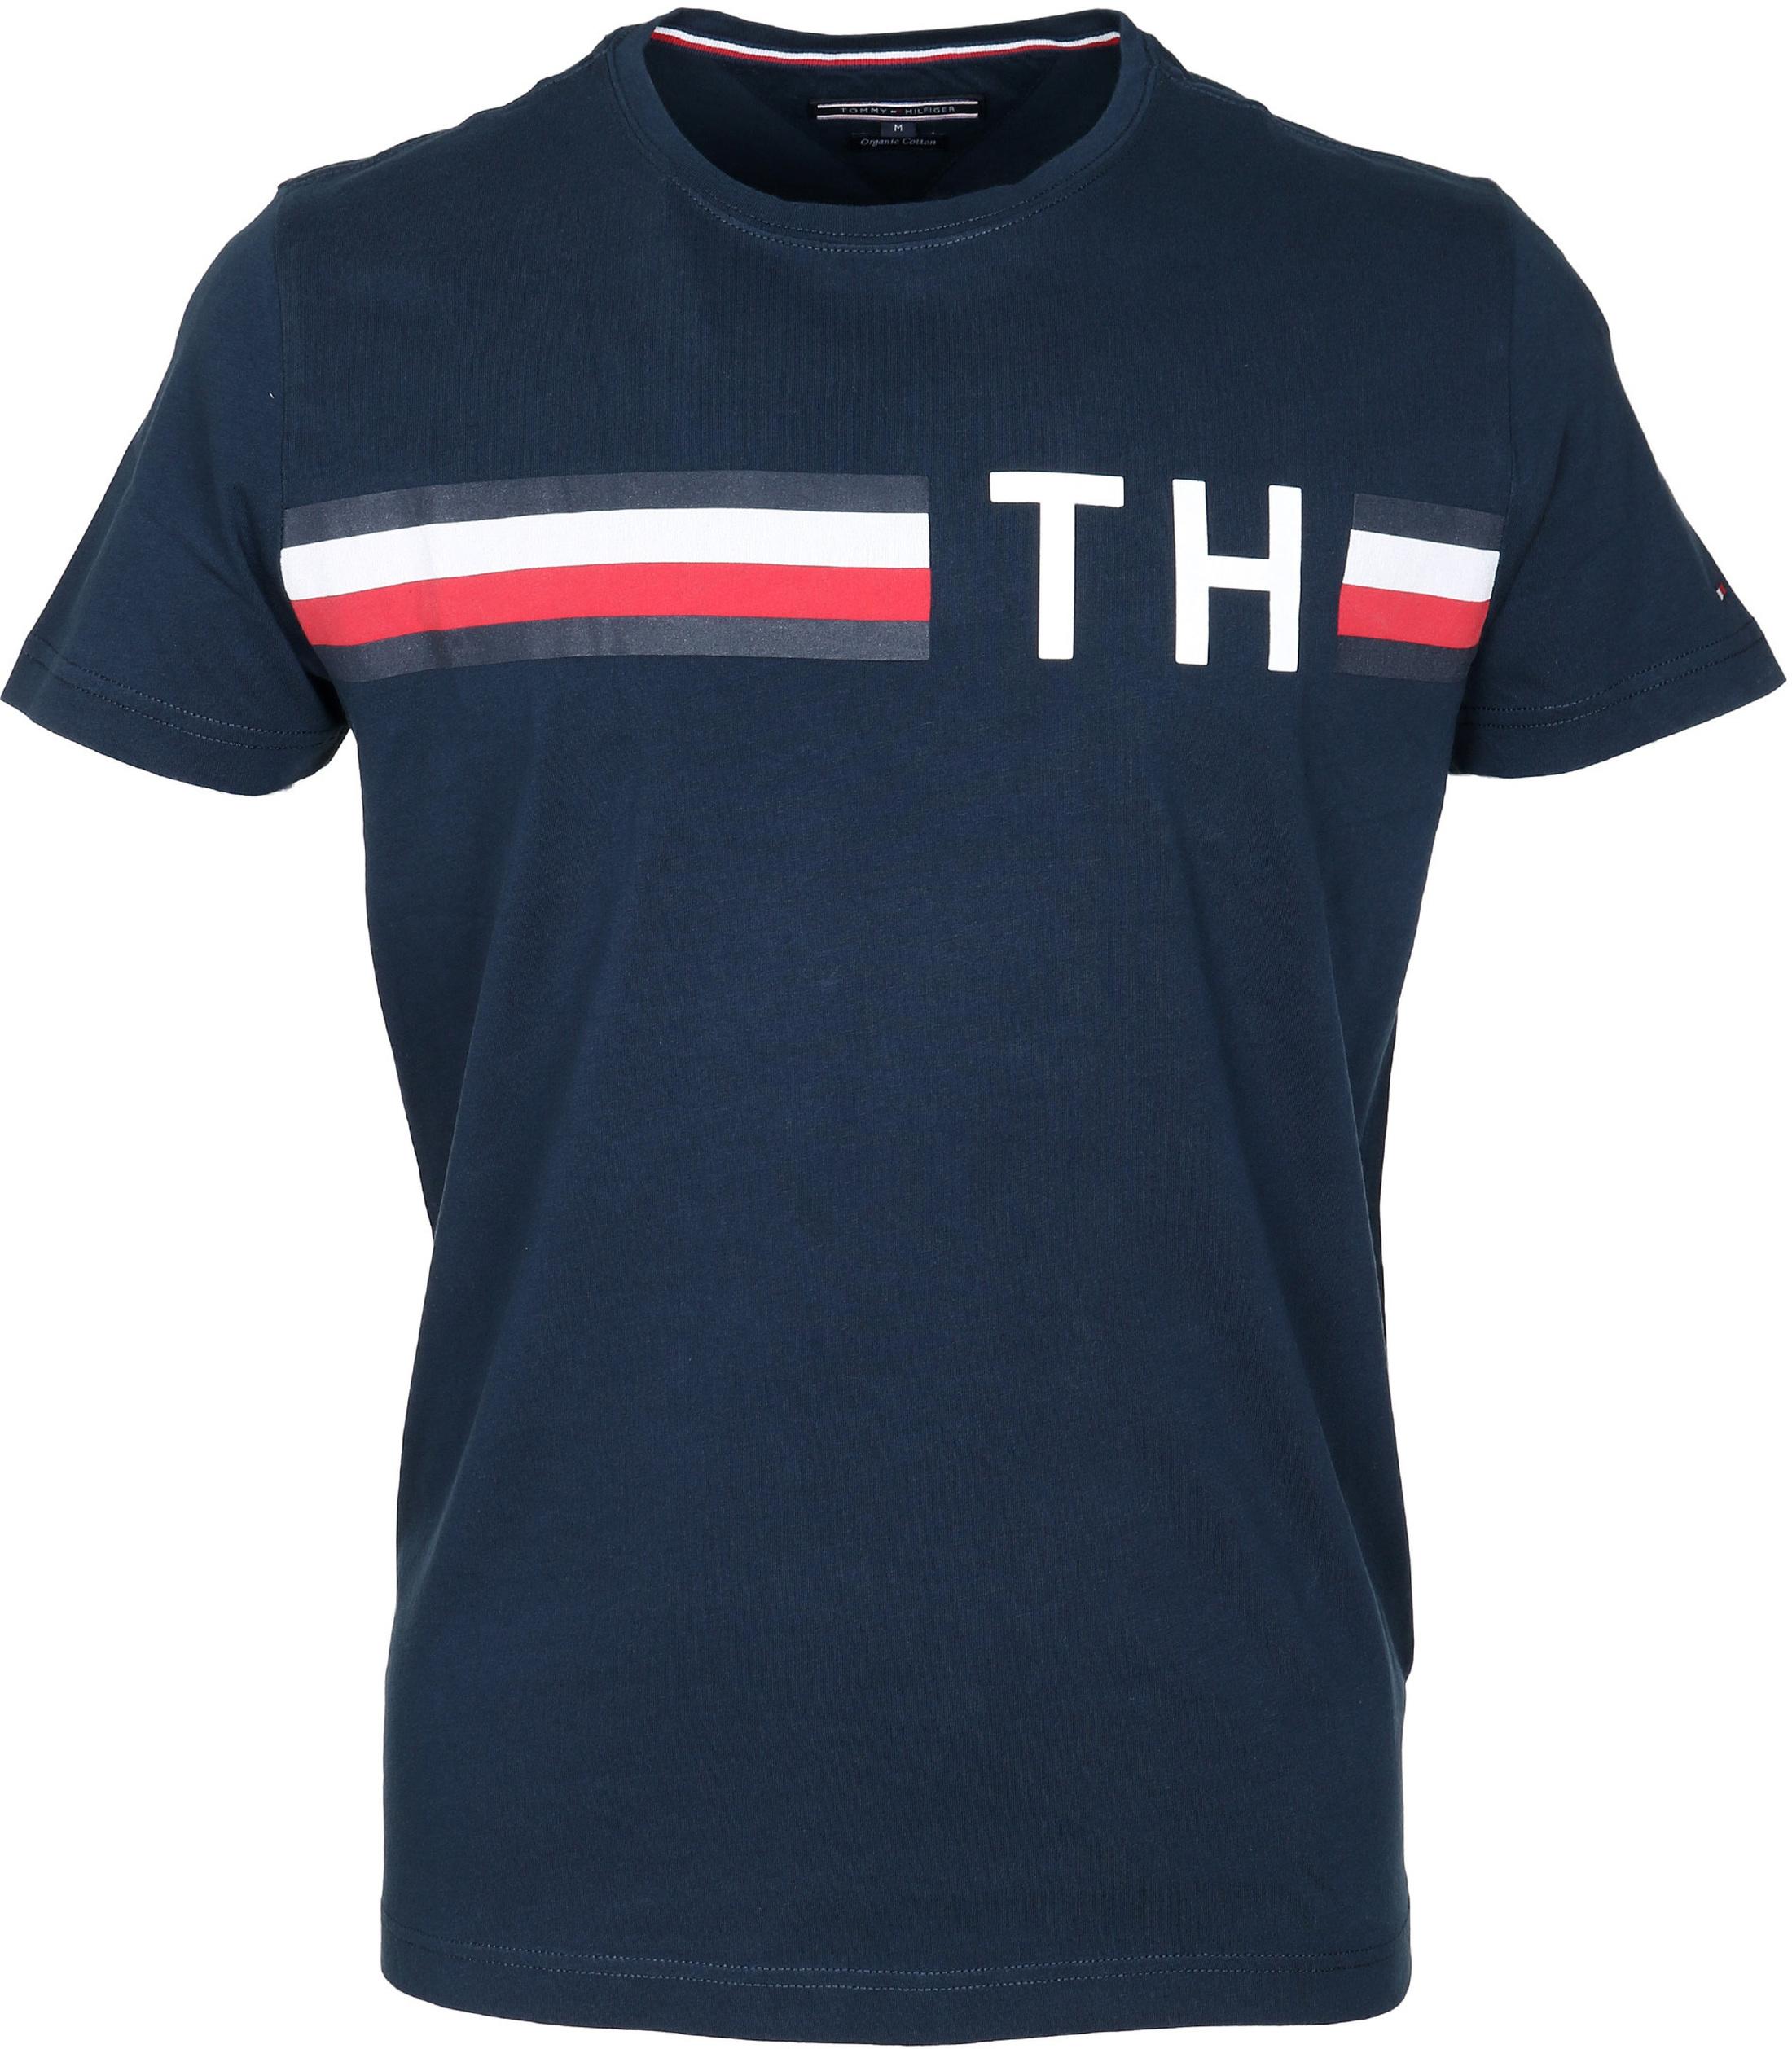 Tommy Hilfiger T-shirt TH Dunkelblau foto 0